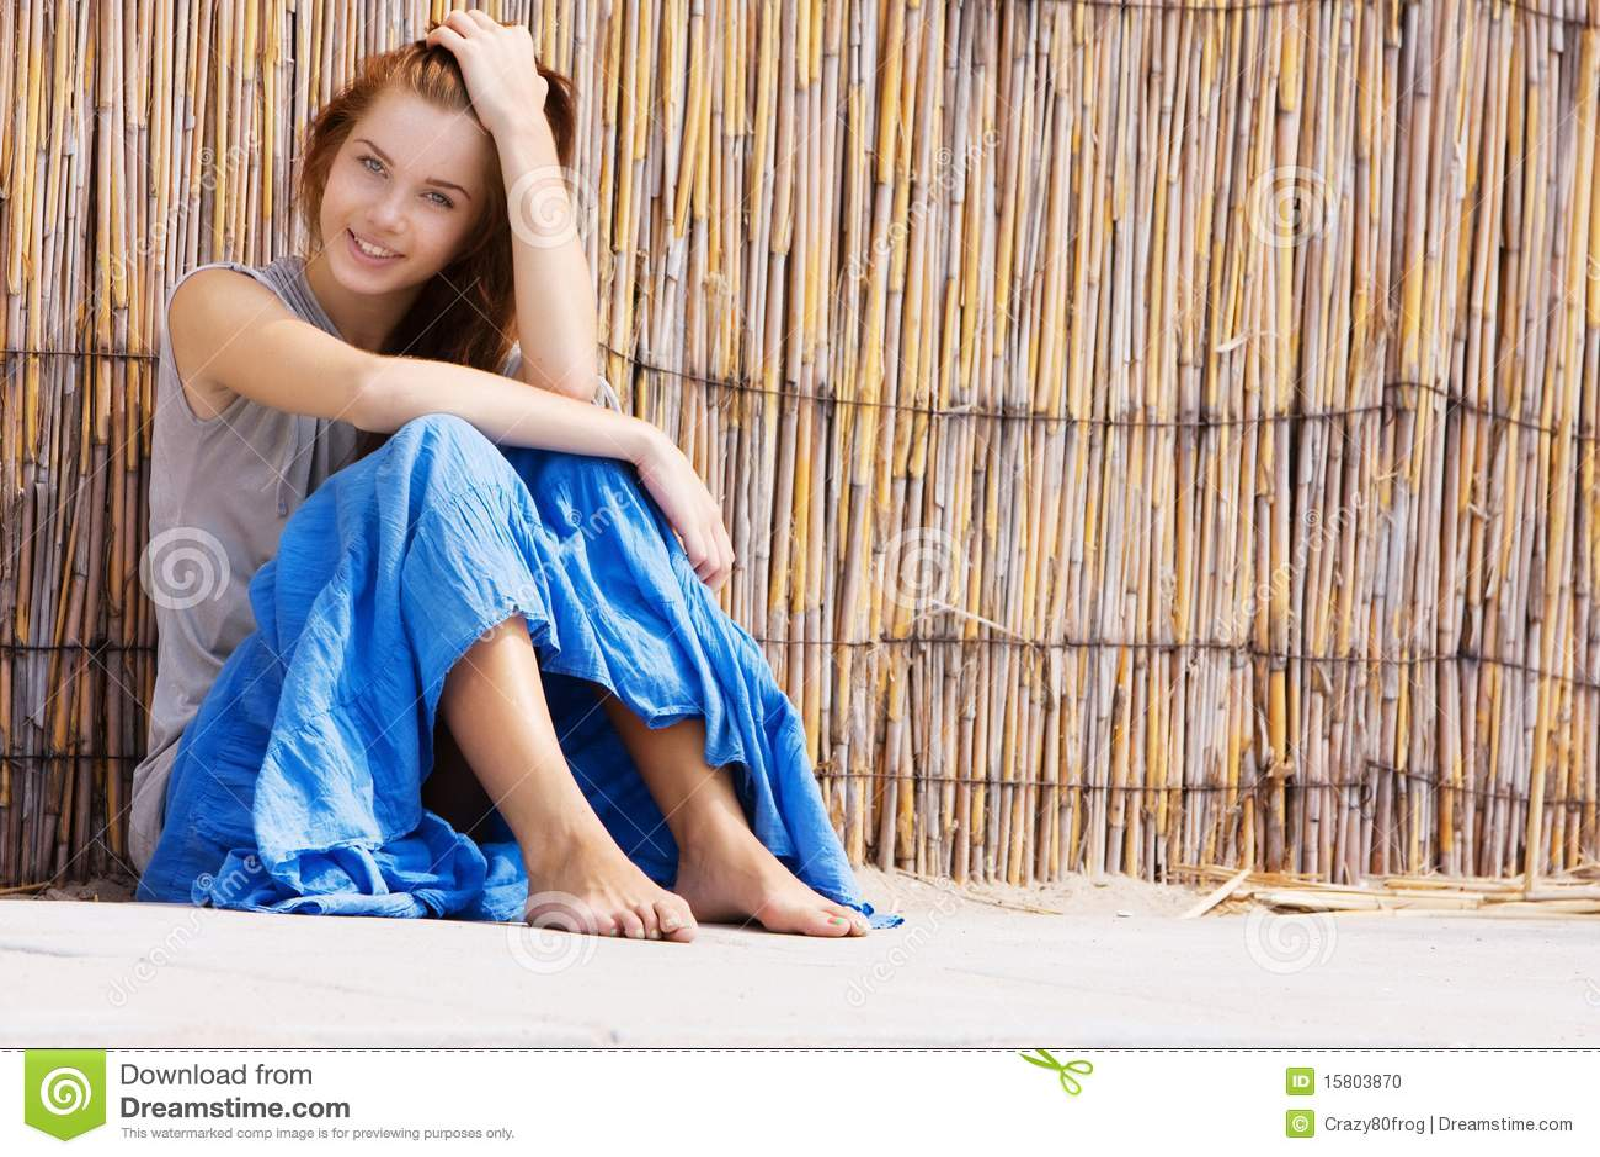 Bamboo girl